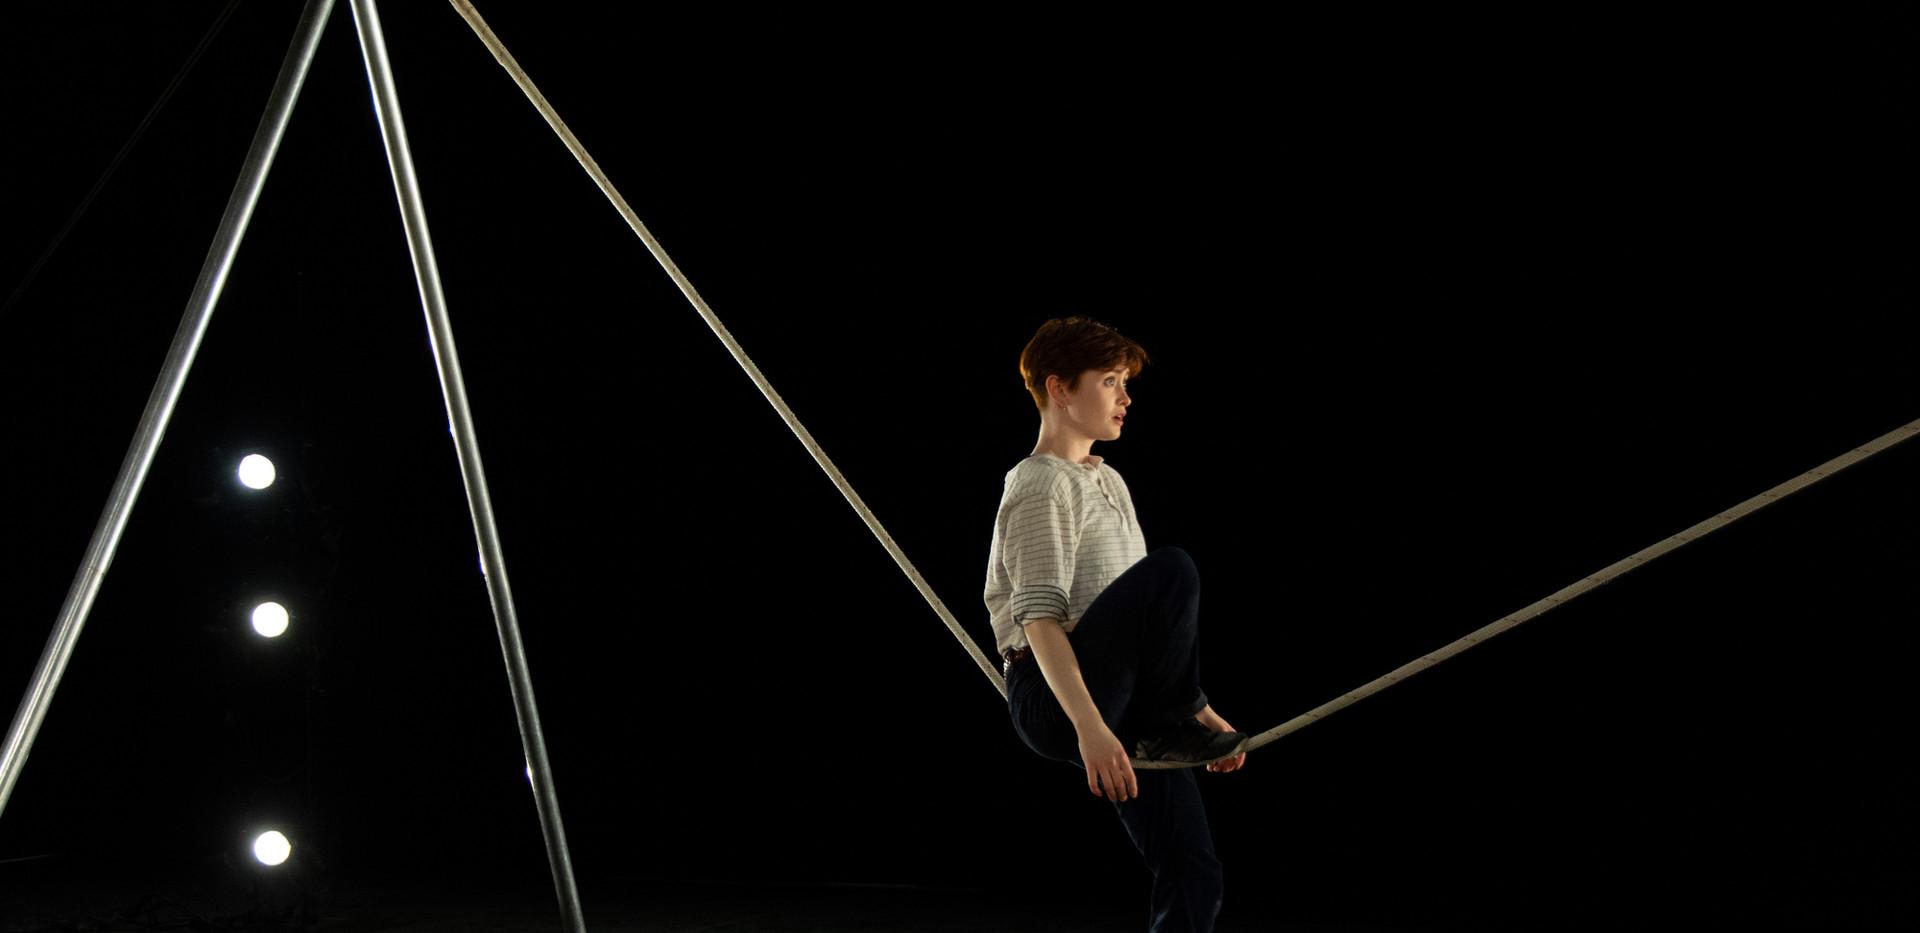 slack rope